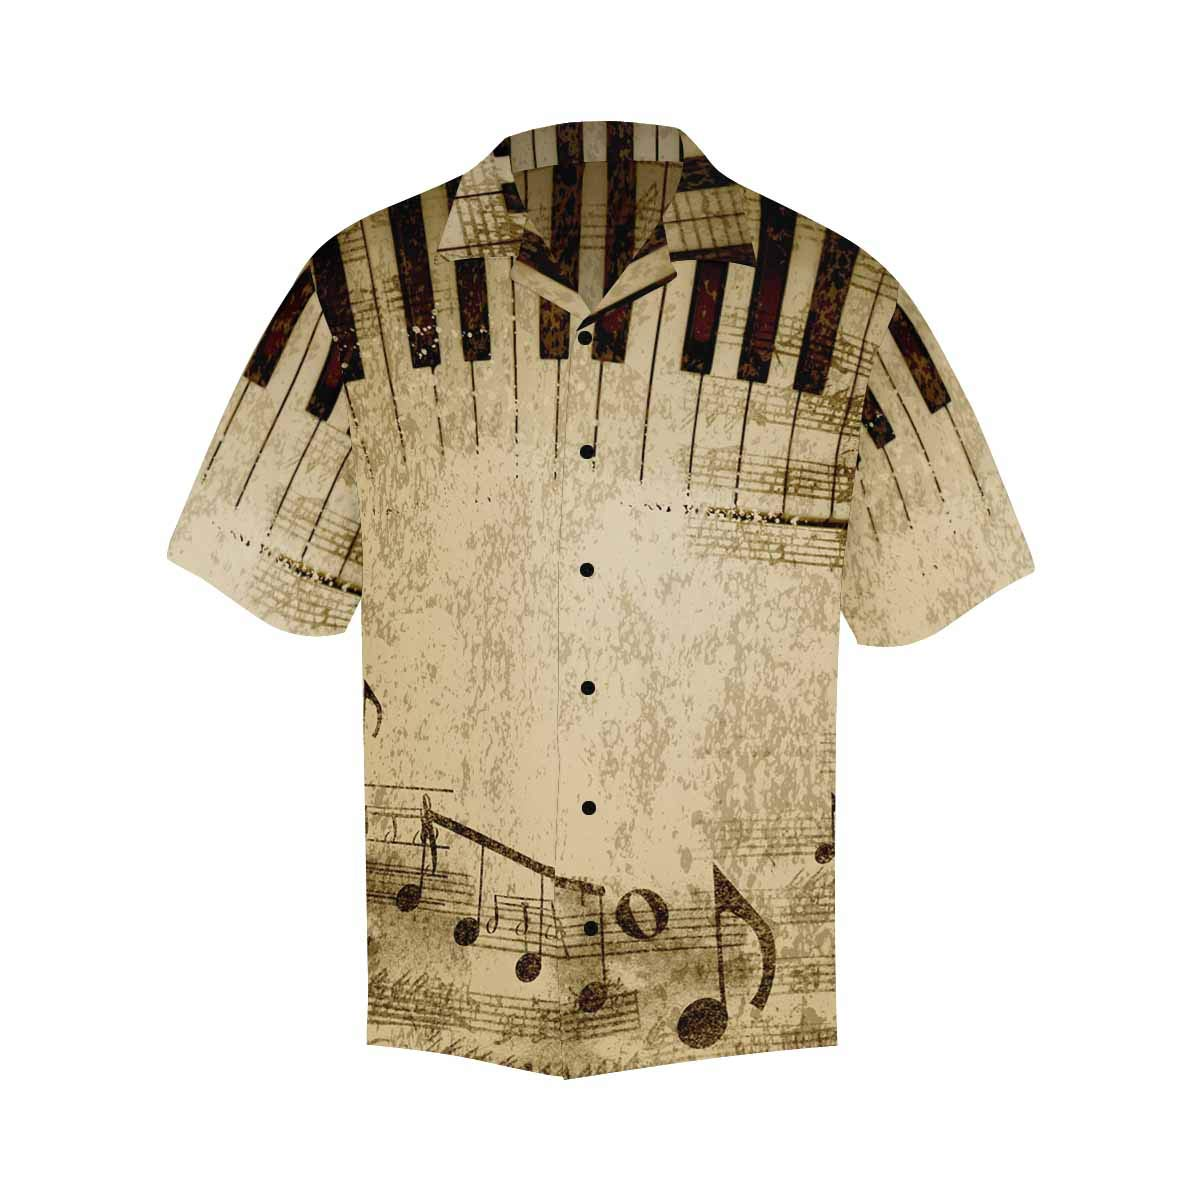 Comfortable and Breathable InterestPrint Retro Audio Equipment Short-Sleeve Shirt